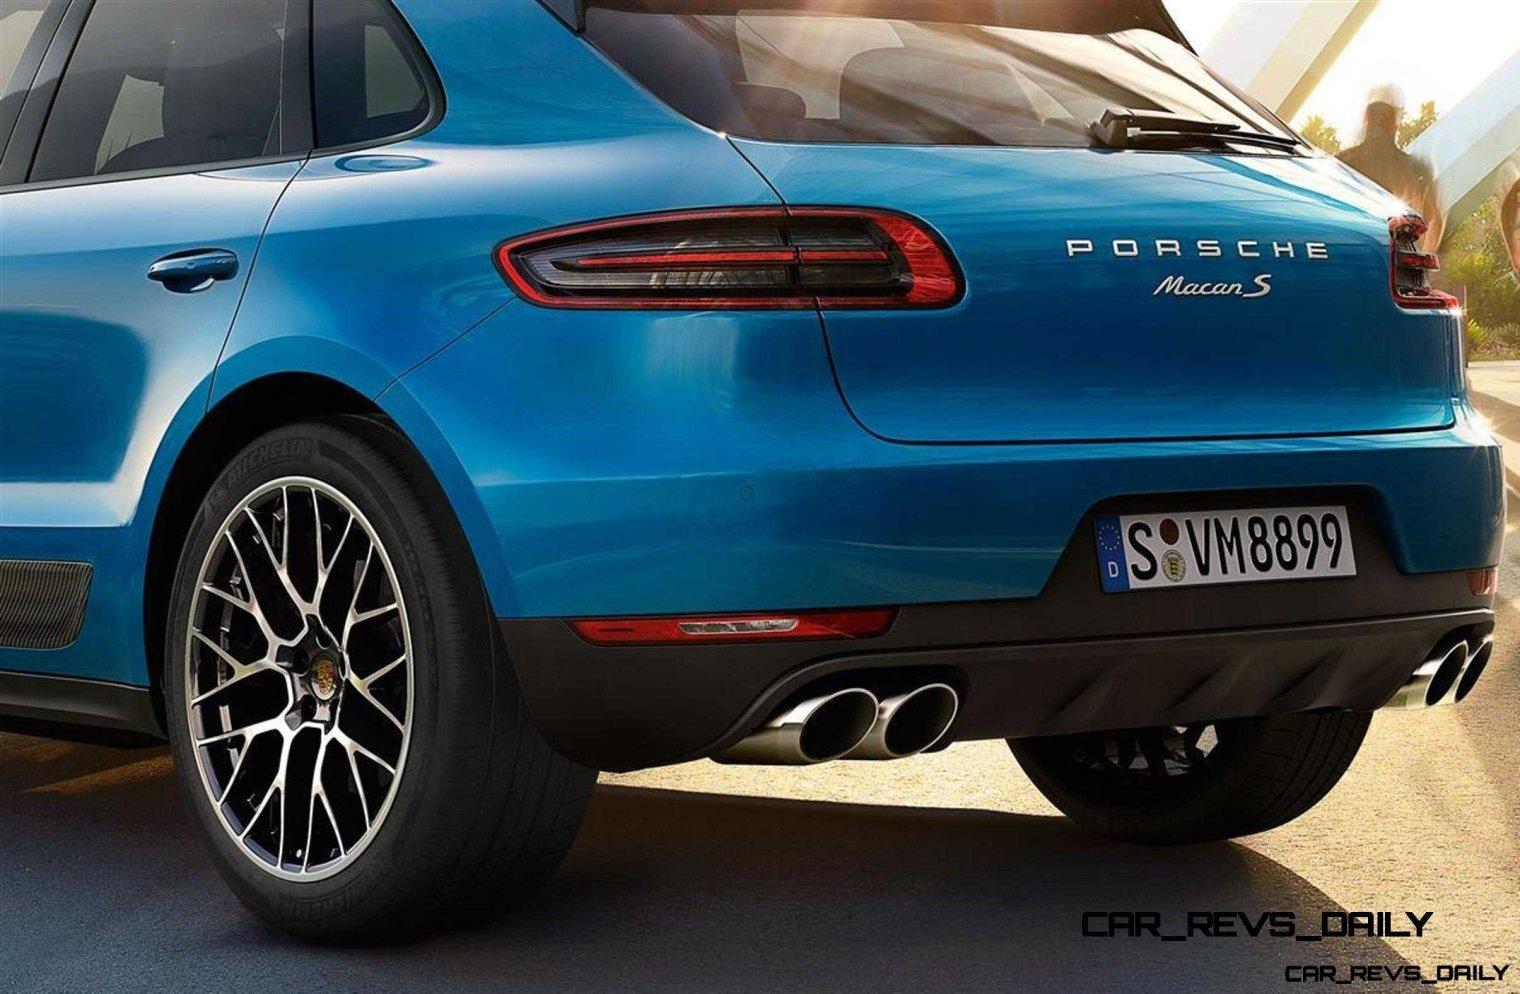 2015 Porsche Macan - Latest Images - CarRevsDaily.com 46